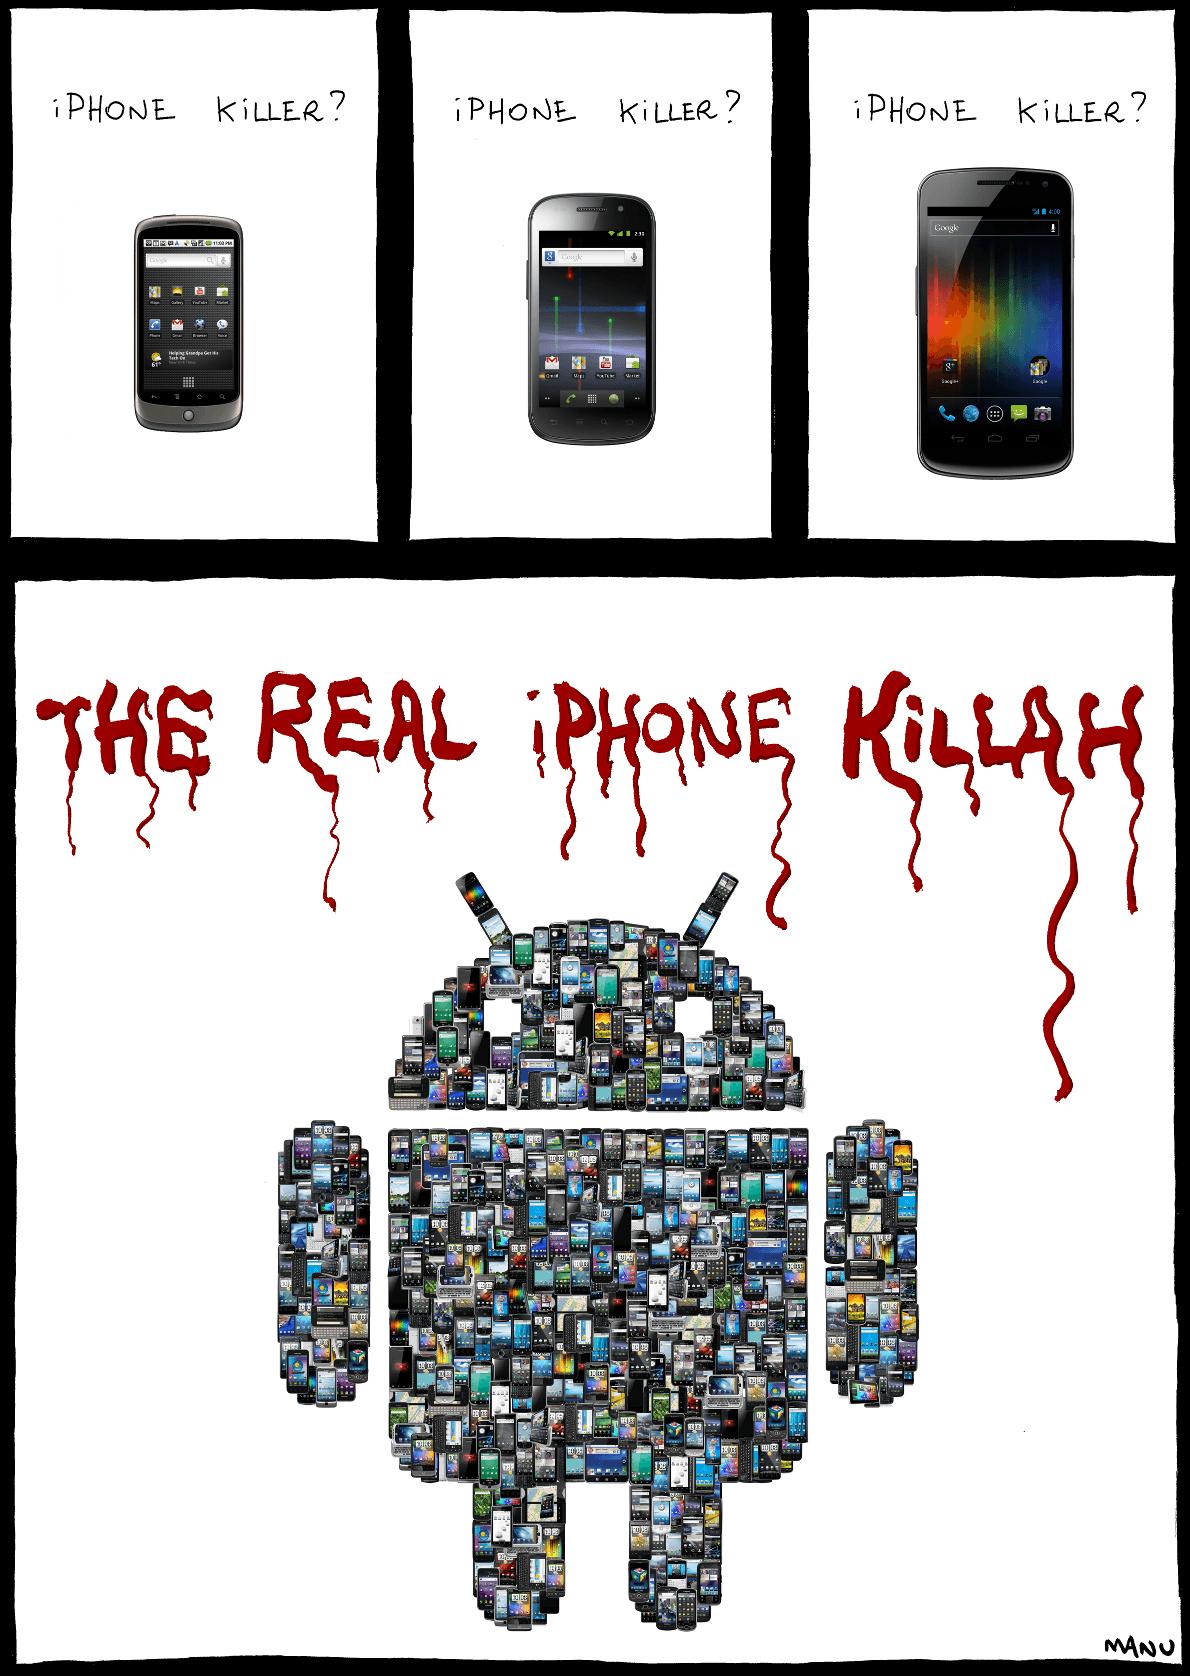 real_iPhone_killer